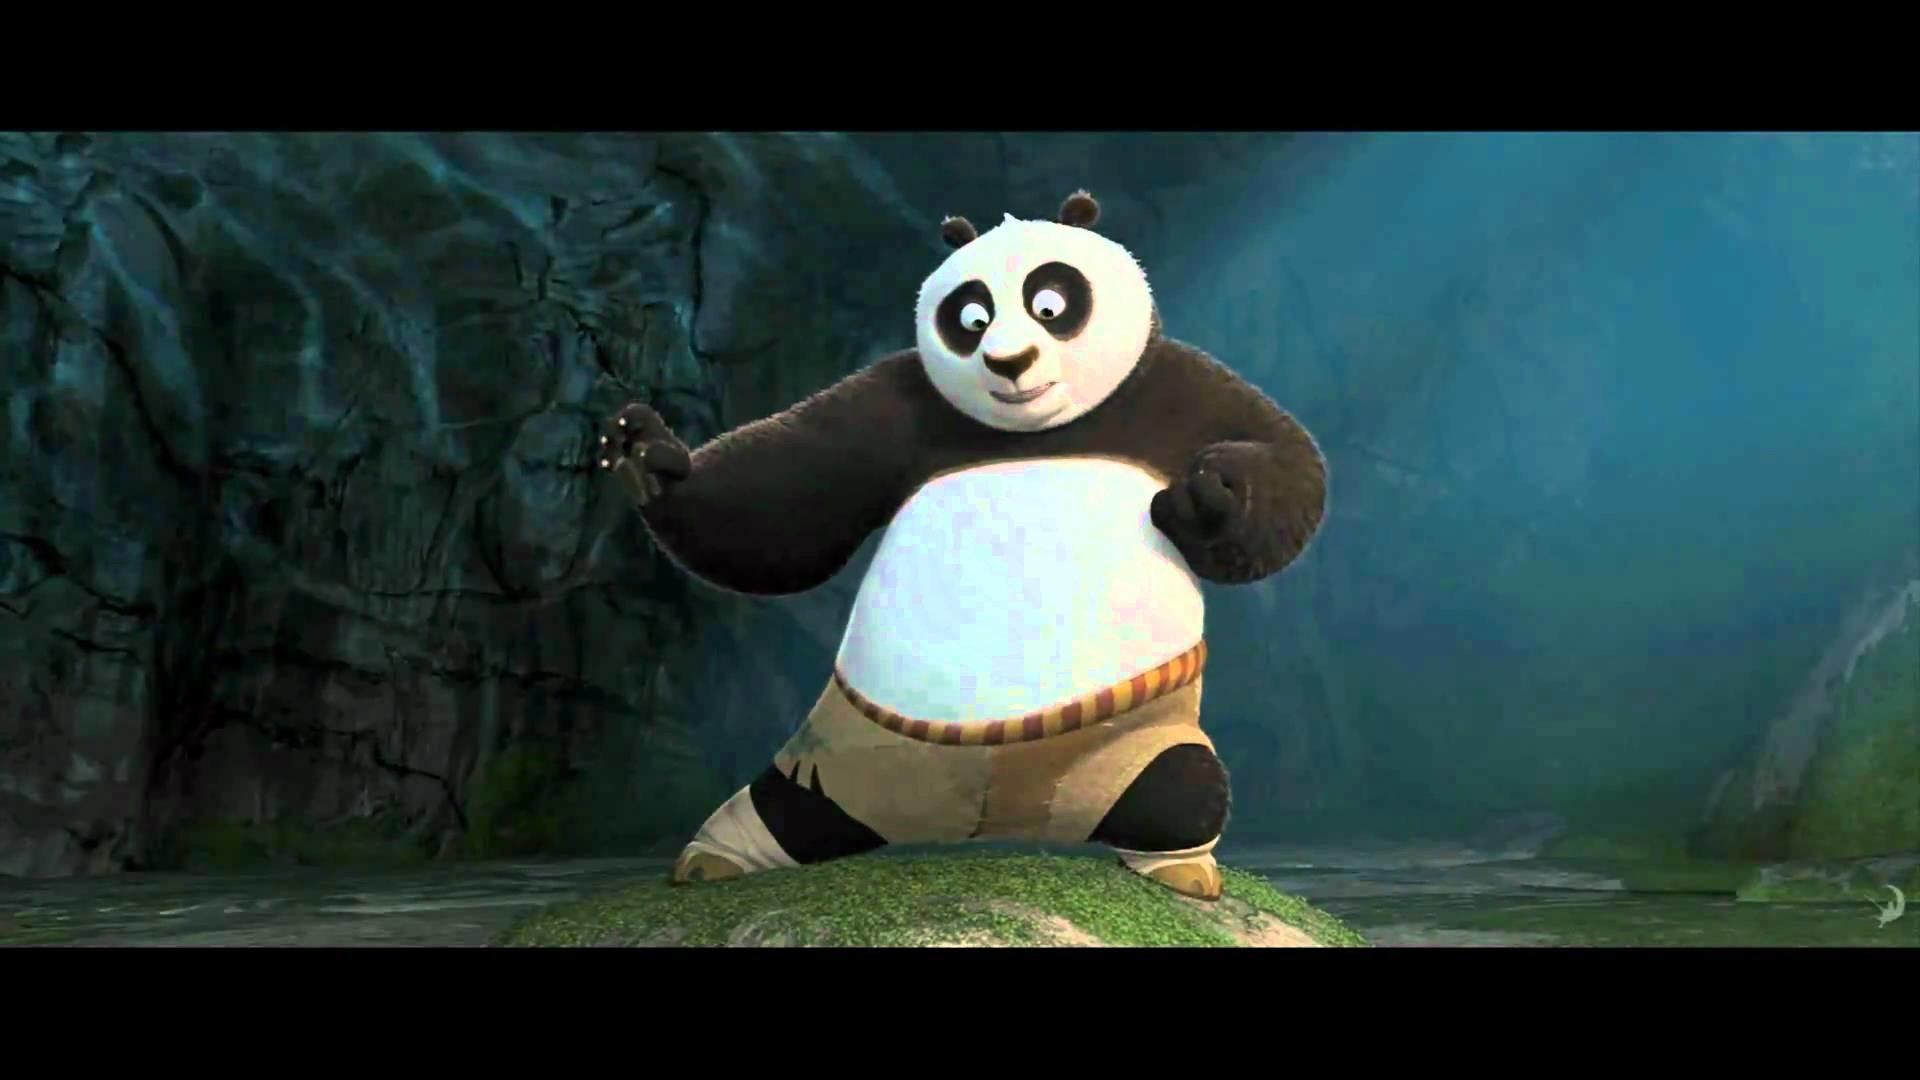 Res: 1920x1080, Kung fu panda wallpapers HD free download.